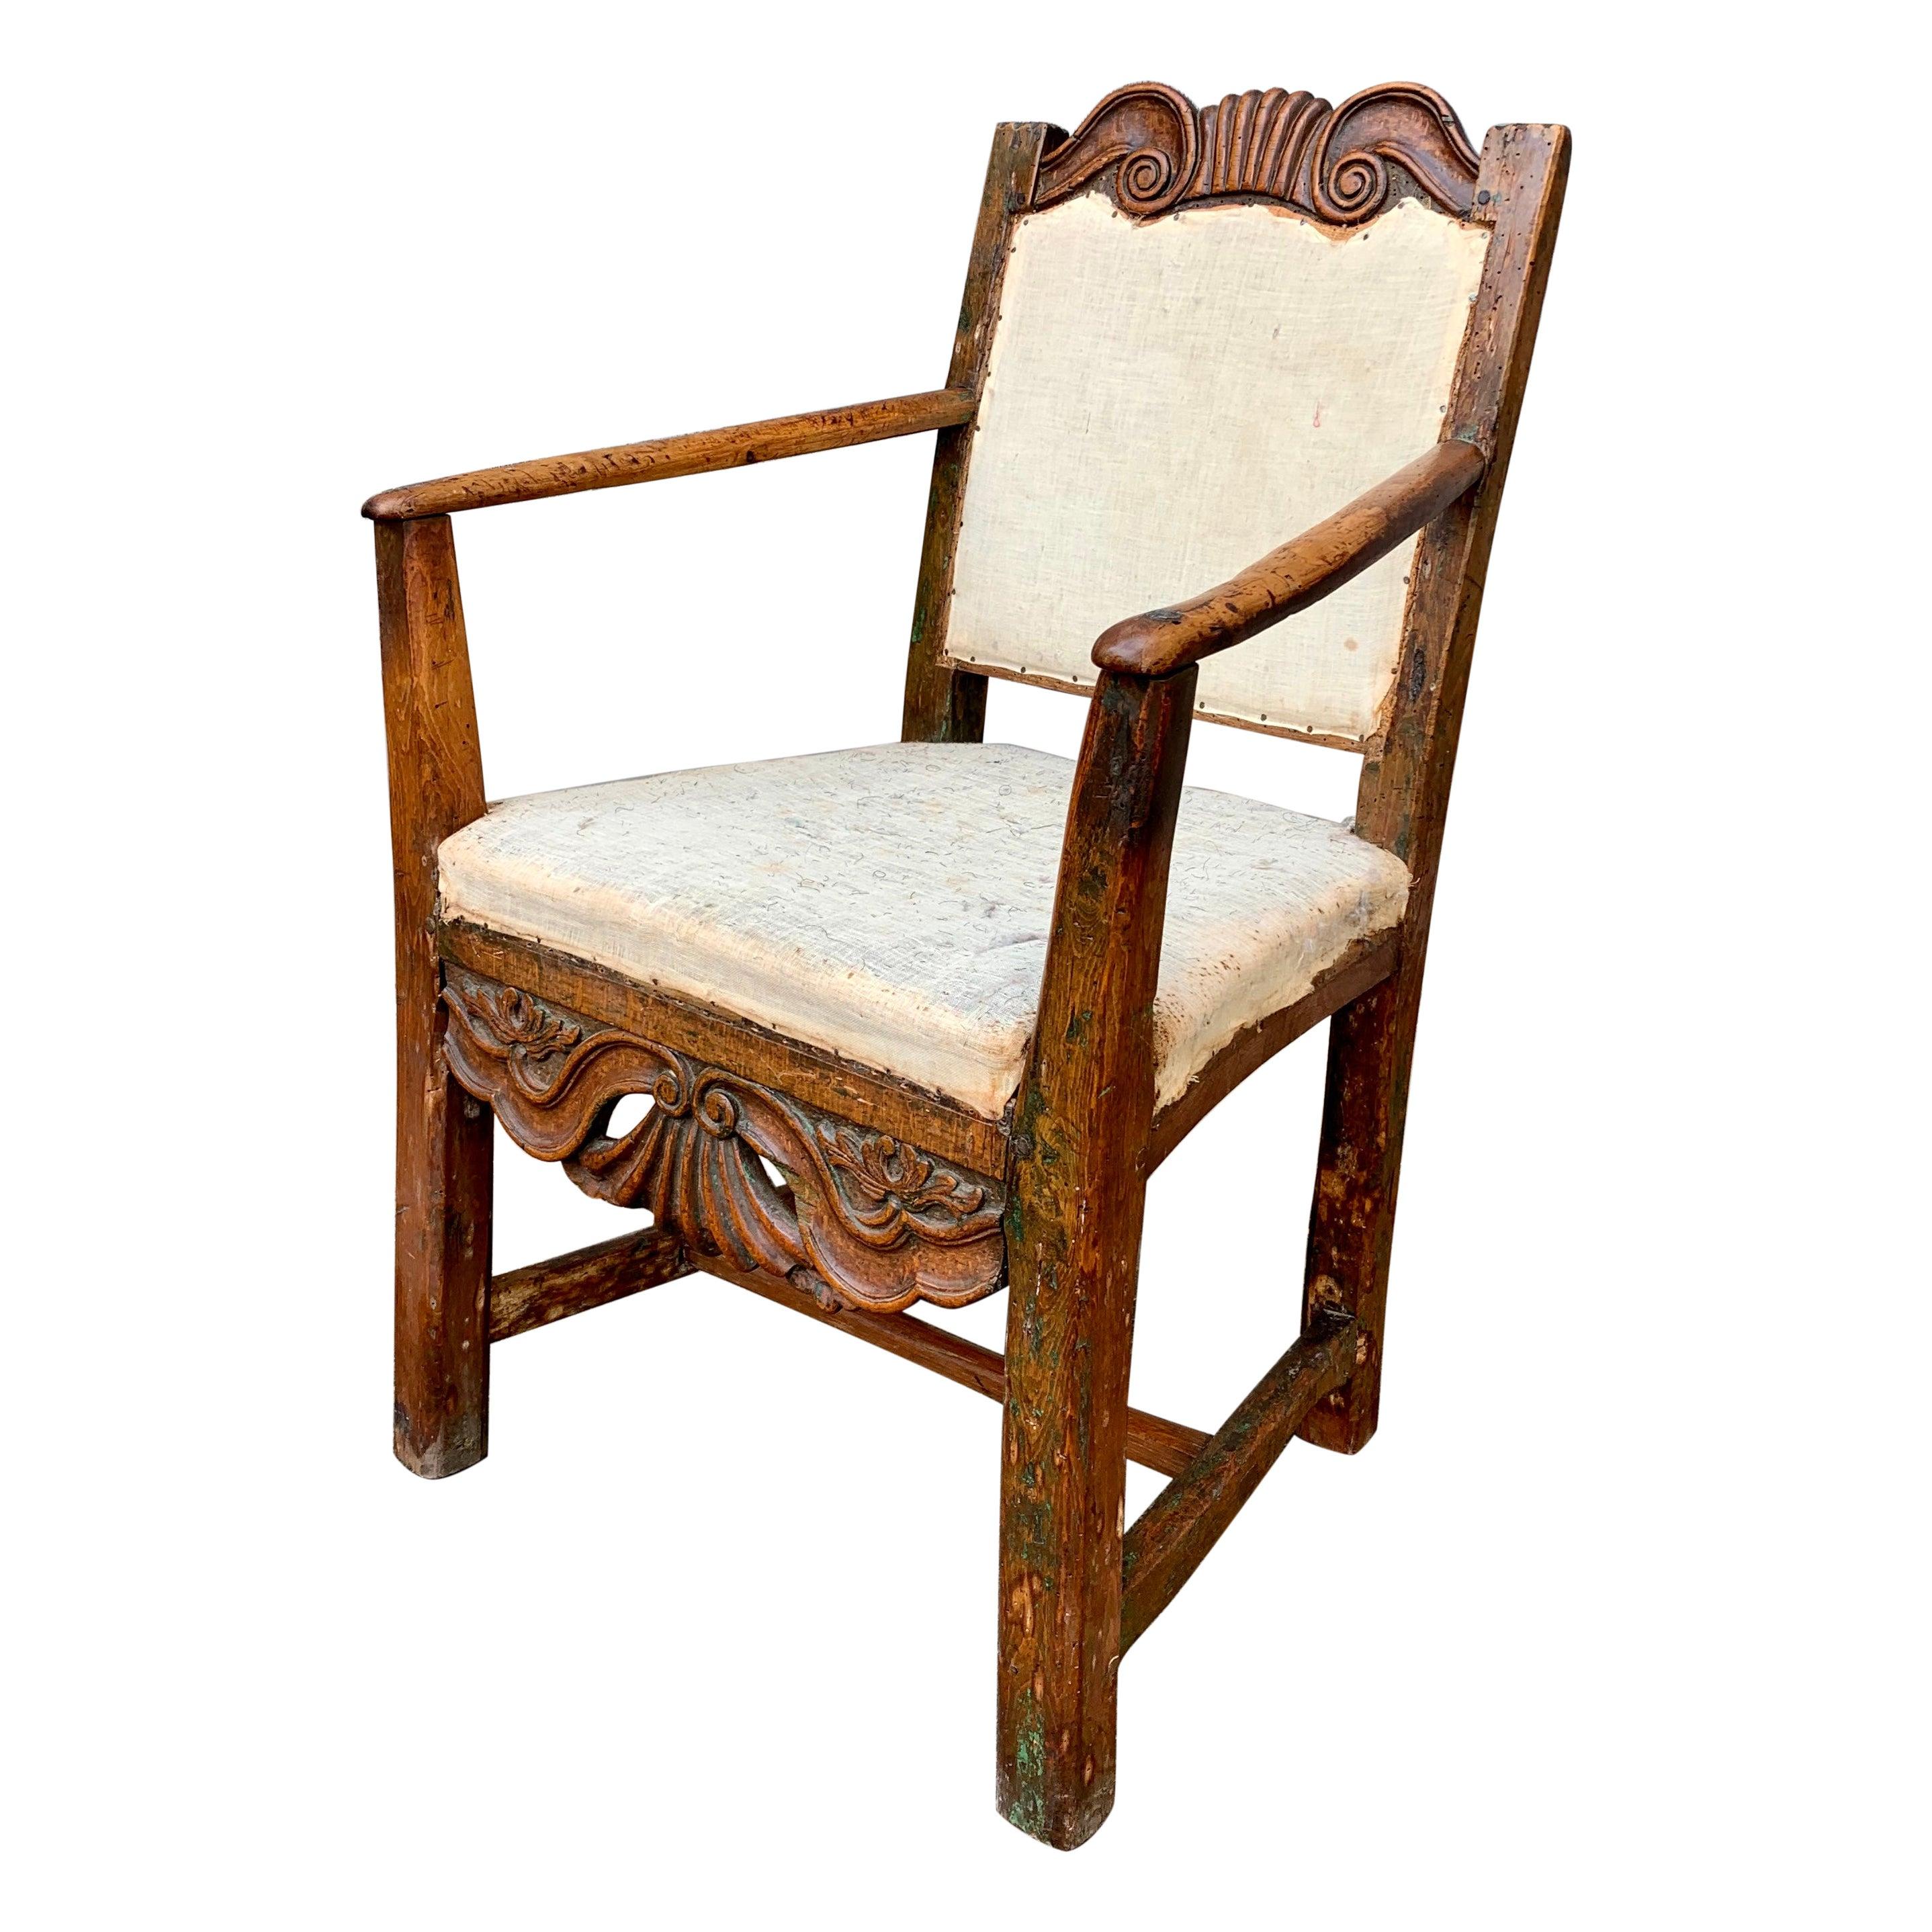 Small Swedish 18th Century Primitive Rococo Folk Art Armchair